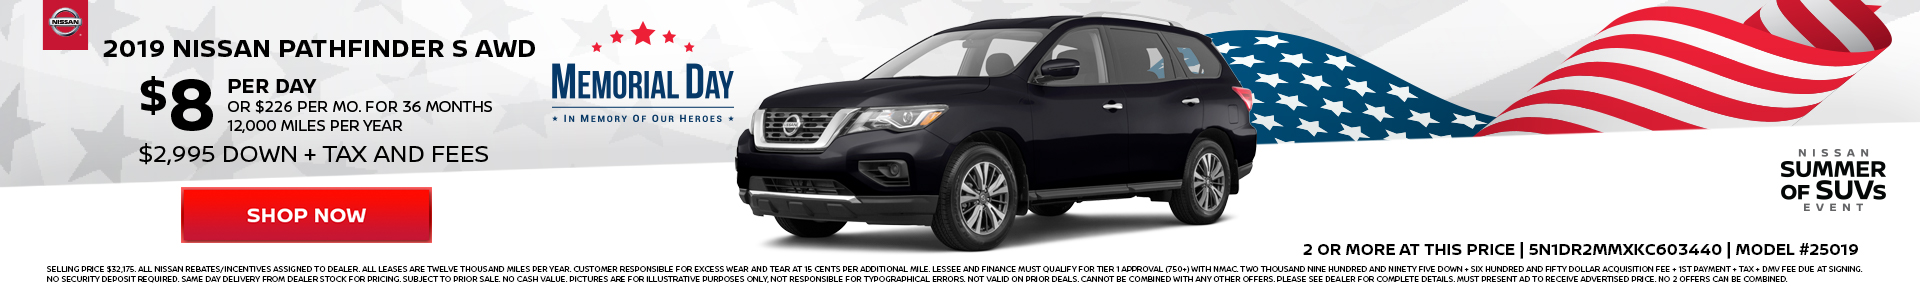 Nissan Pathfinder $8 Lease